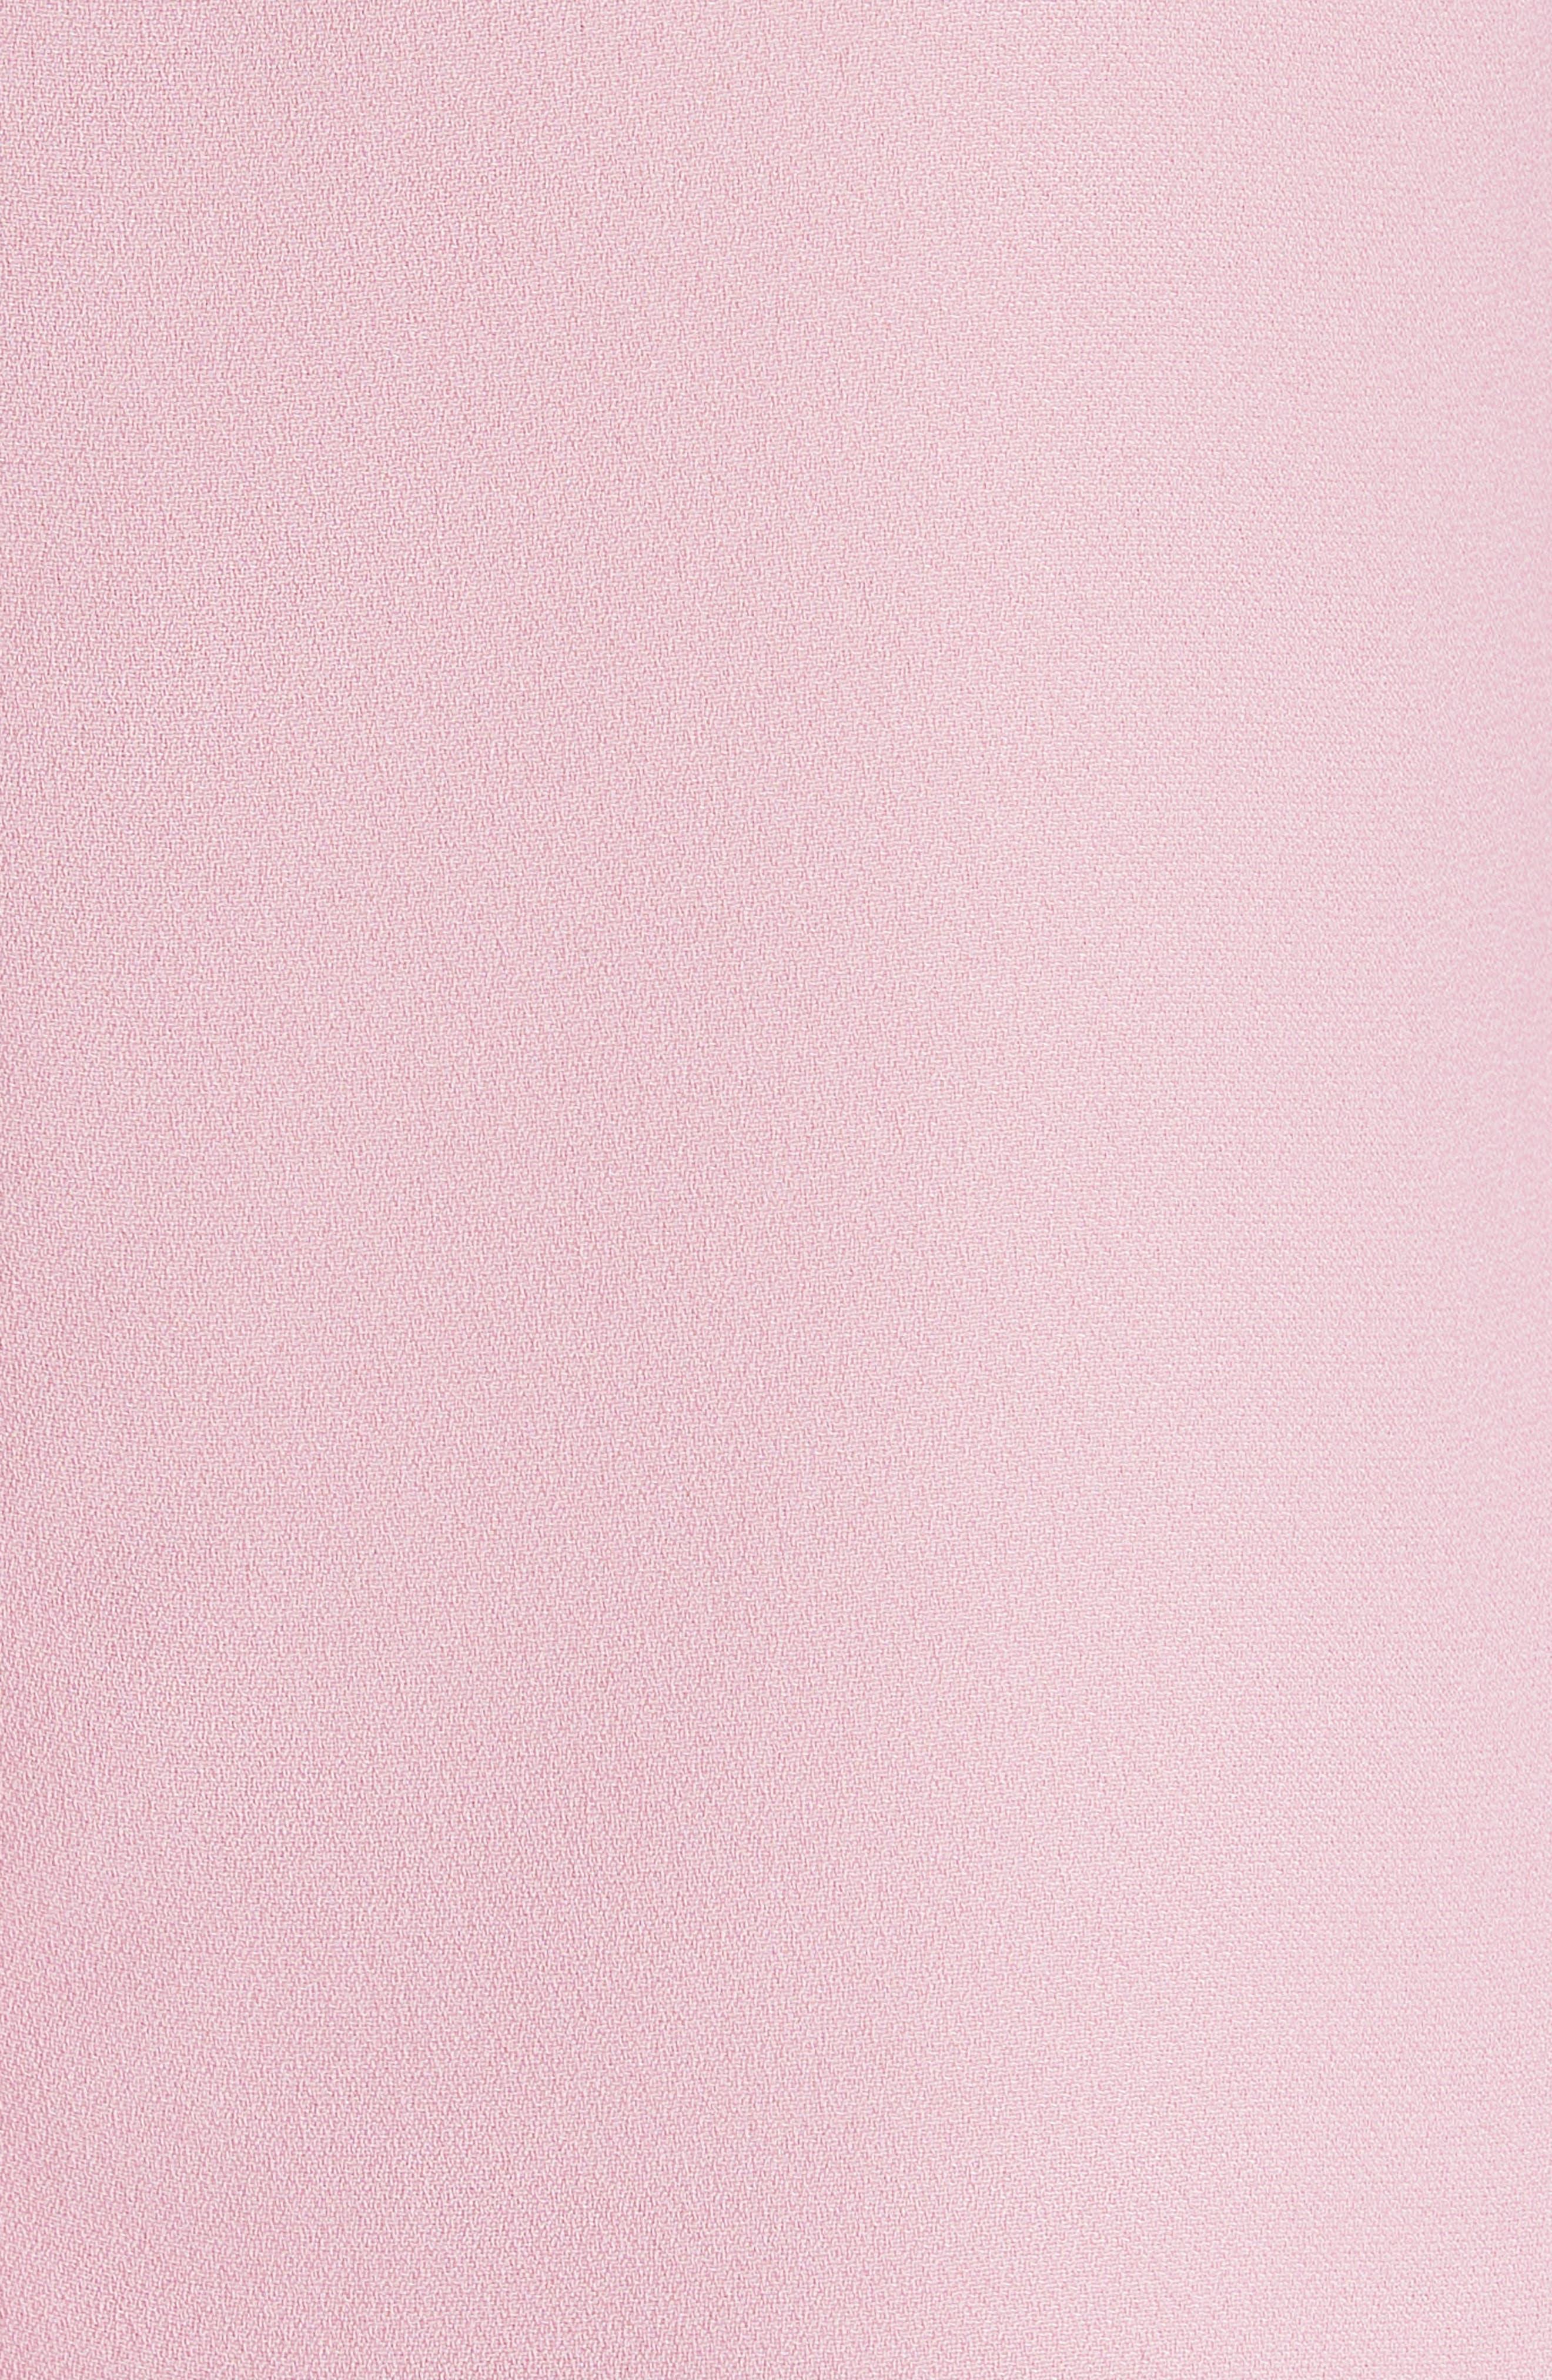 Juula Waterfall Sleeve Top,                             Alternate thumbnail 5, color,                             Dusky Pink